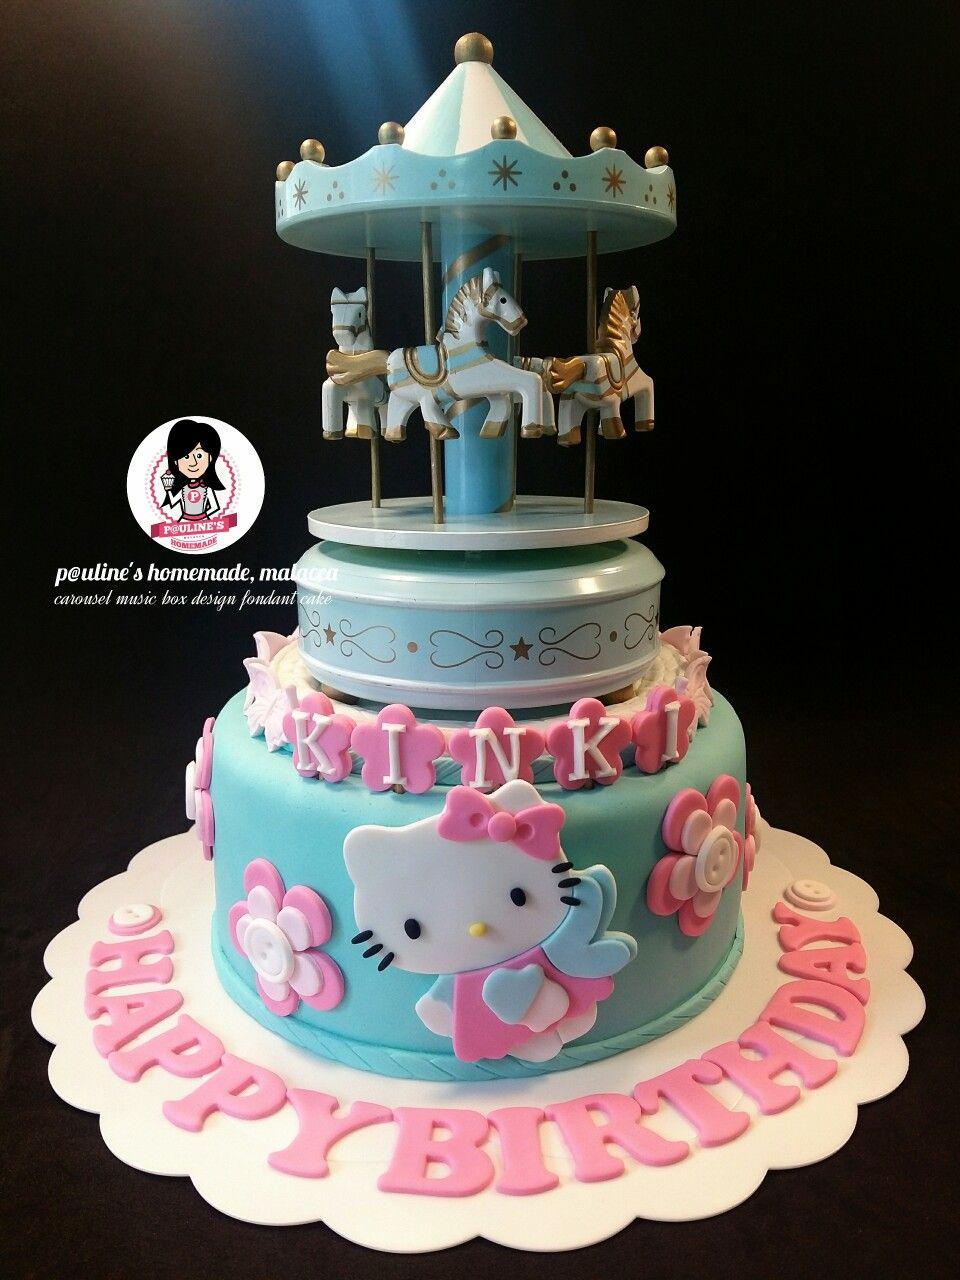 Hello Kitty Carousel Music Box Design Fondant Cake